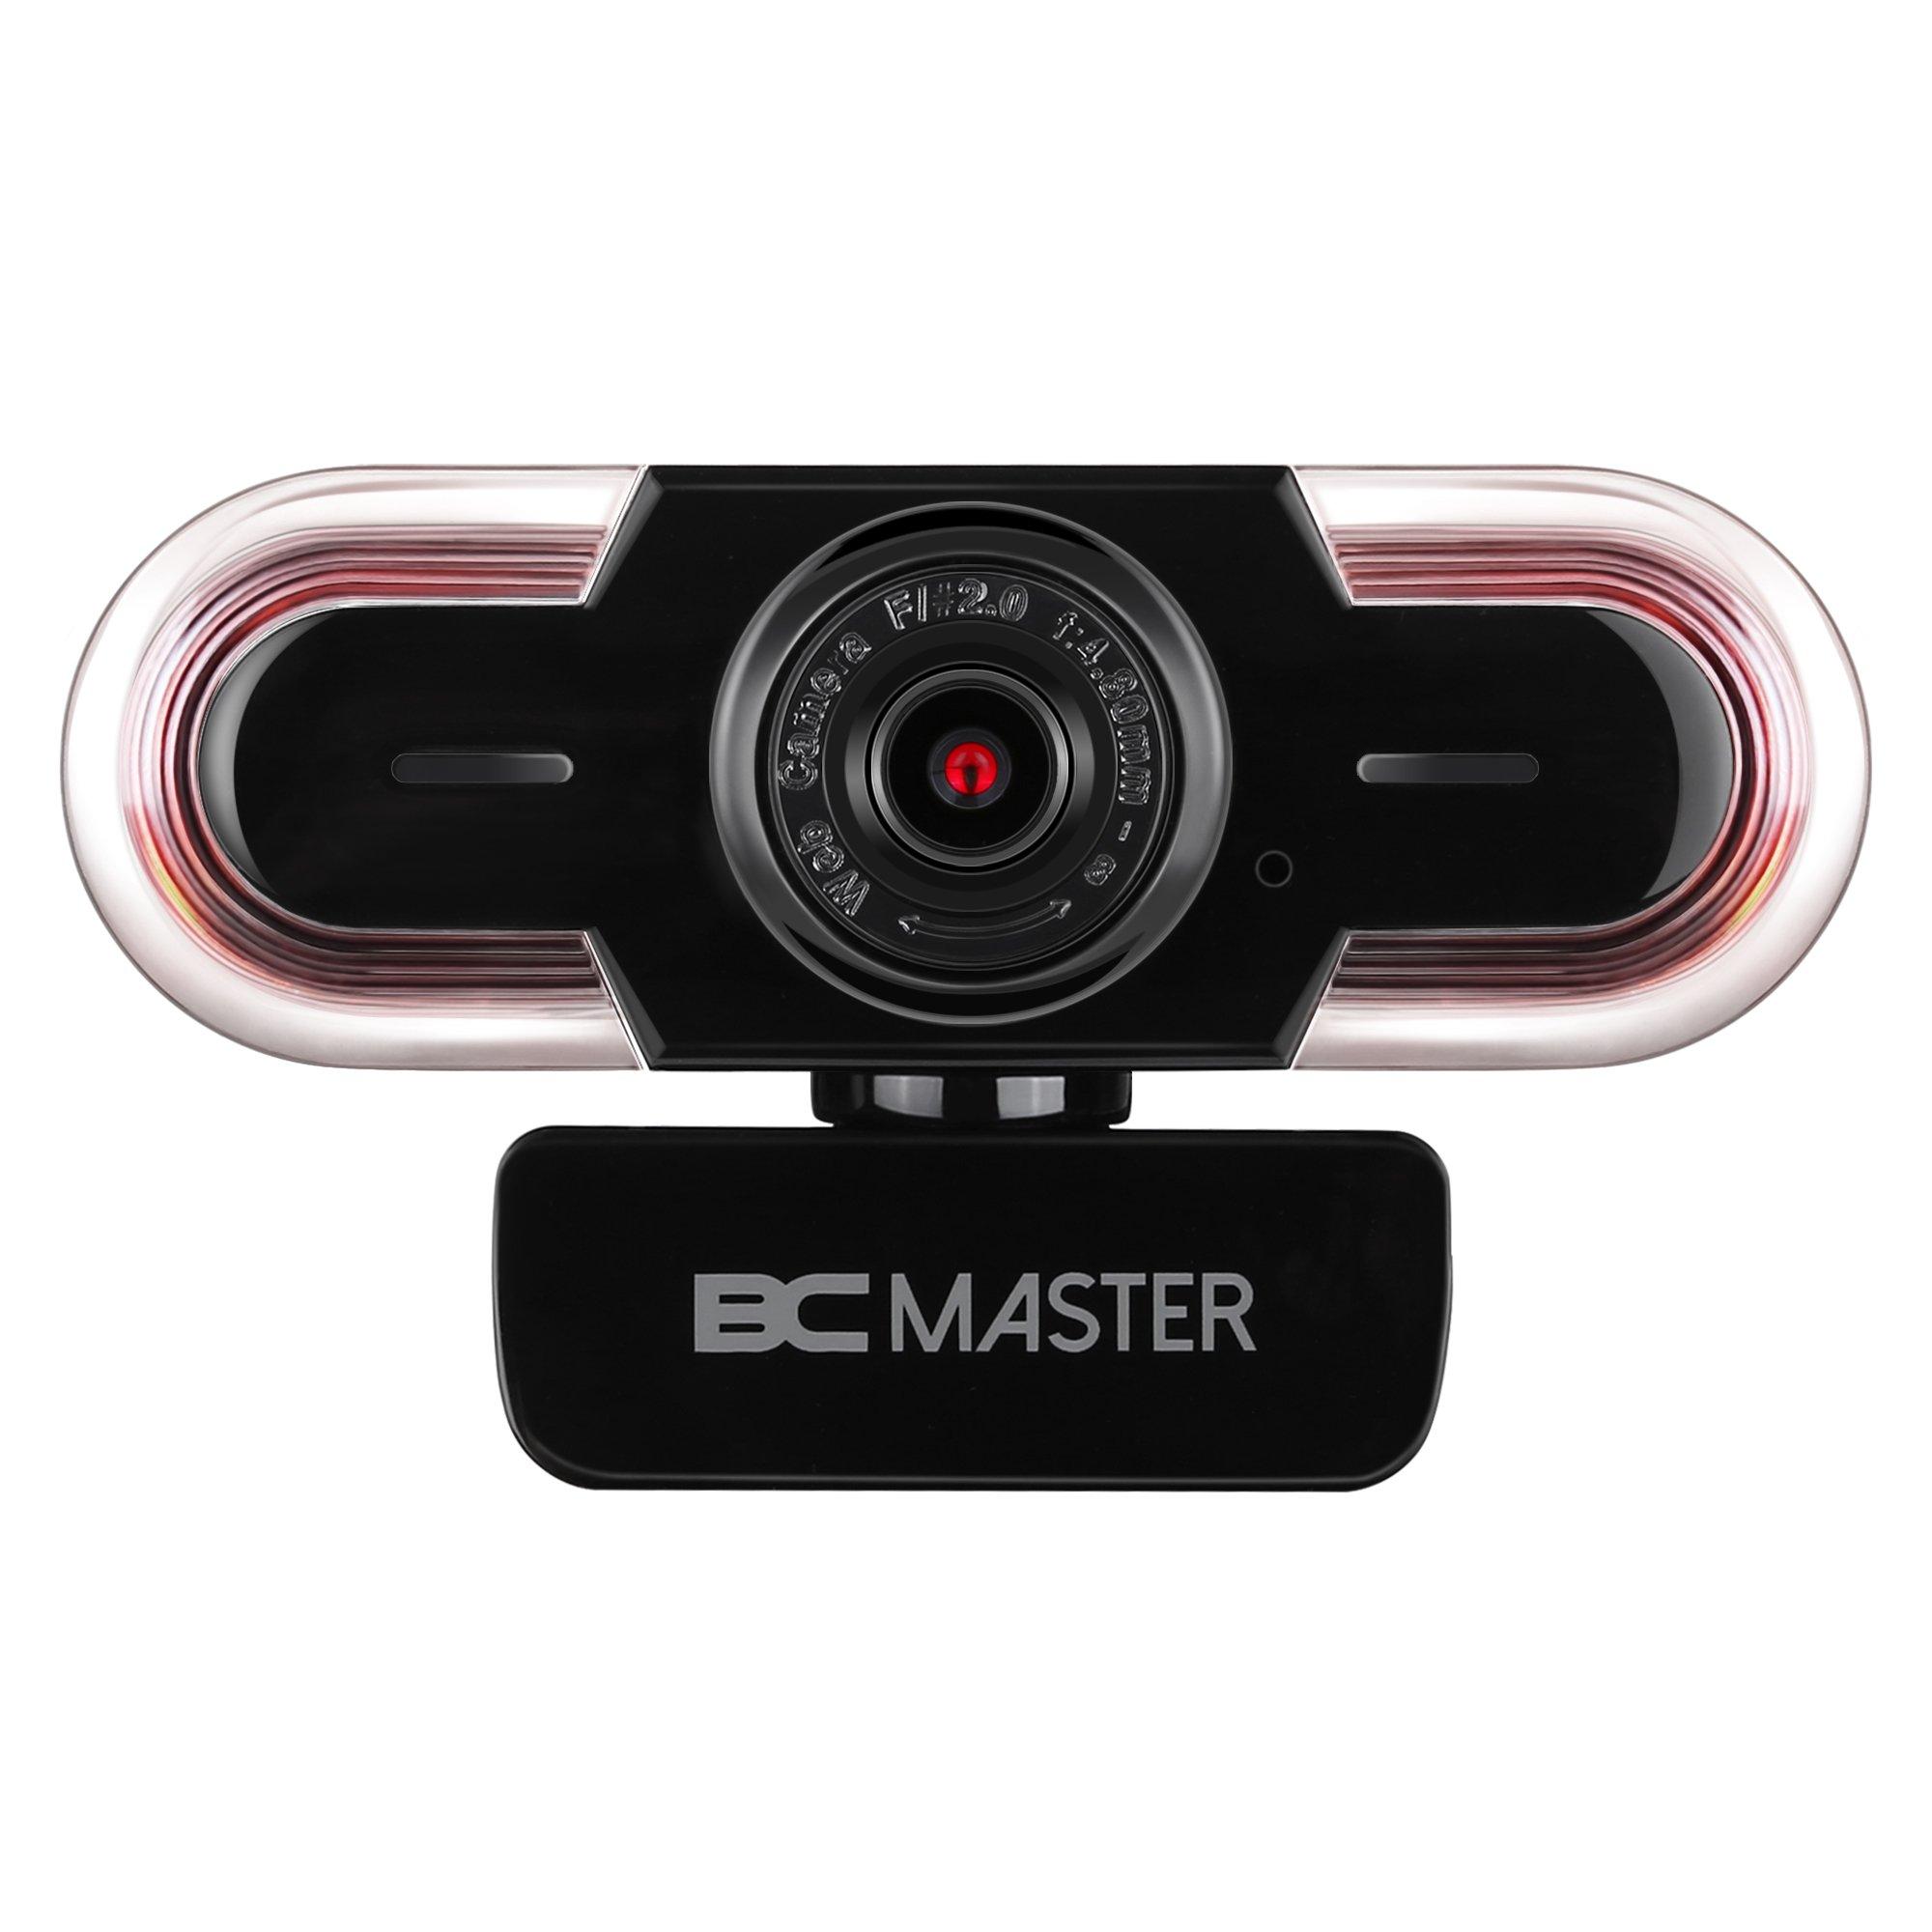 Refurbished Mac Compatible Logitech Webcam Deals